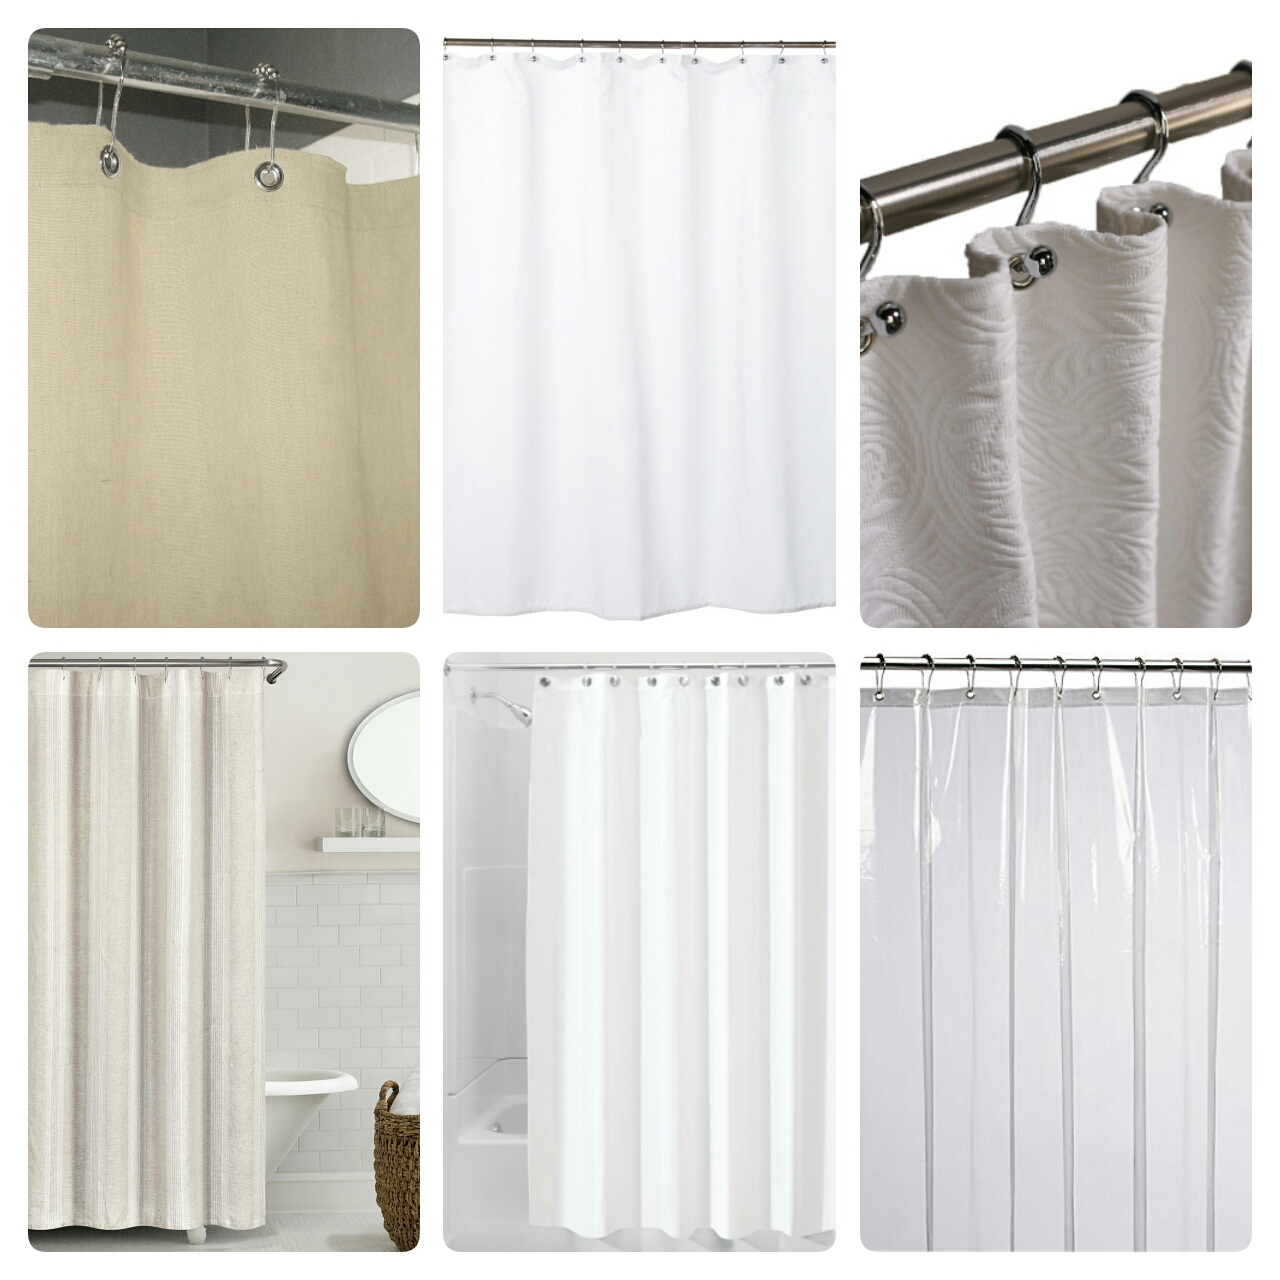 Merveilleux Non Toxic Shower Curtain